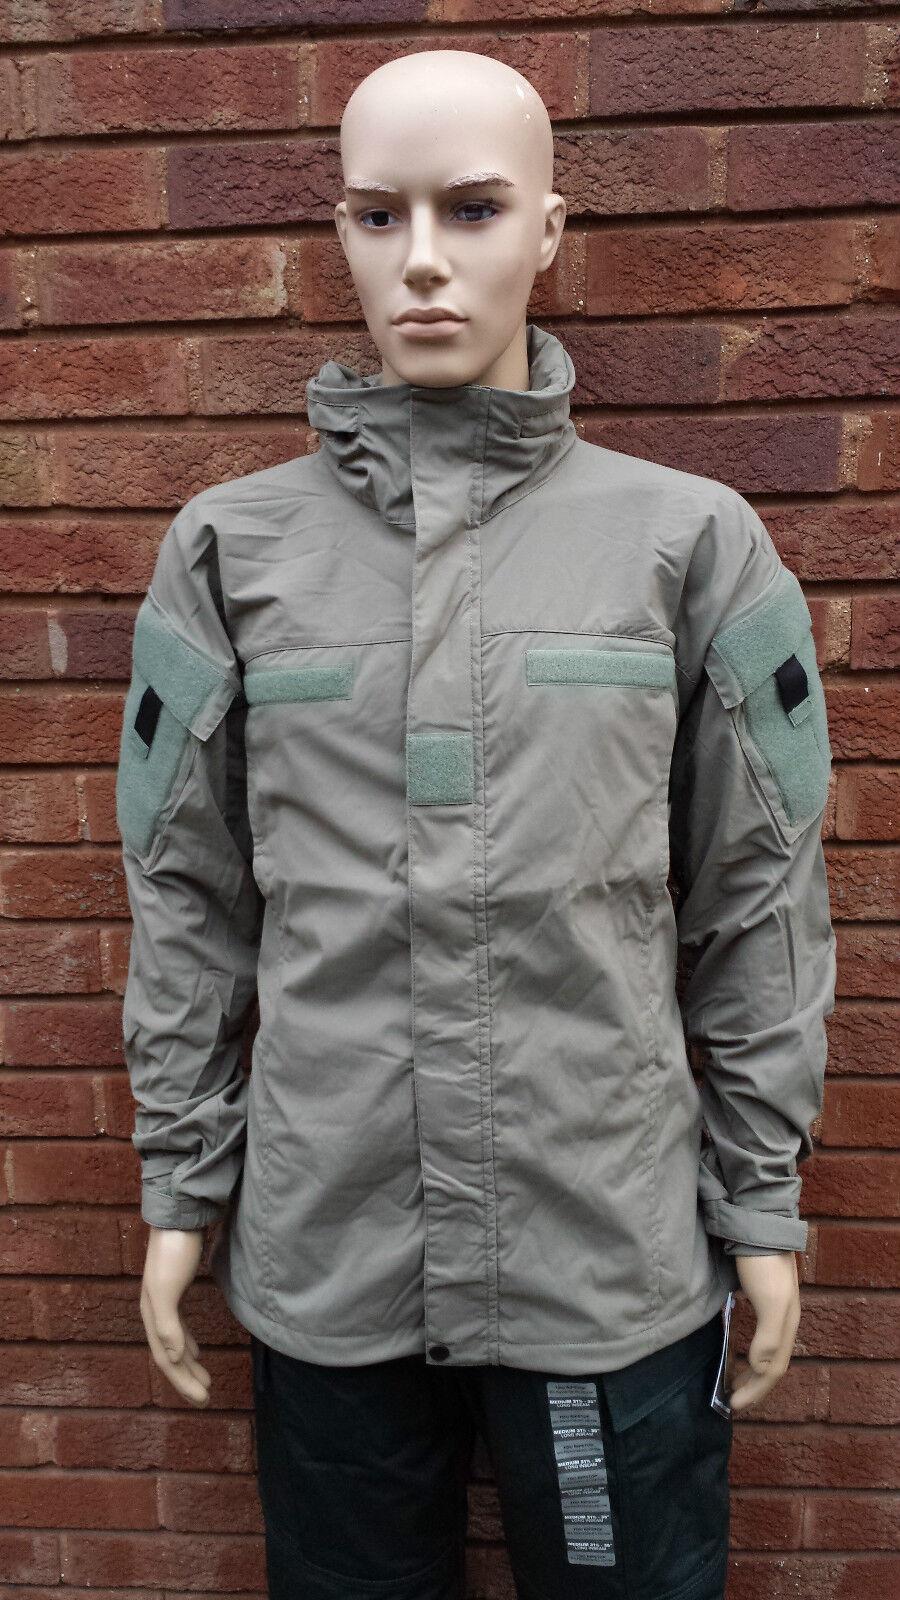 negrohawk Gen Iii Level 5 Soft Shell ECWCS chaqueta GSA Alpha verde Tallas L-xl